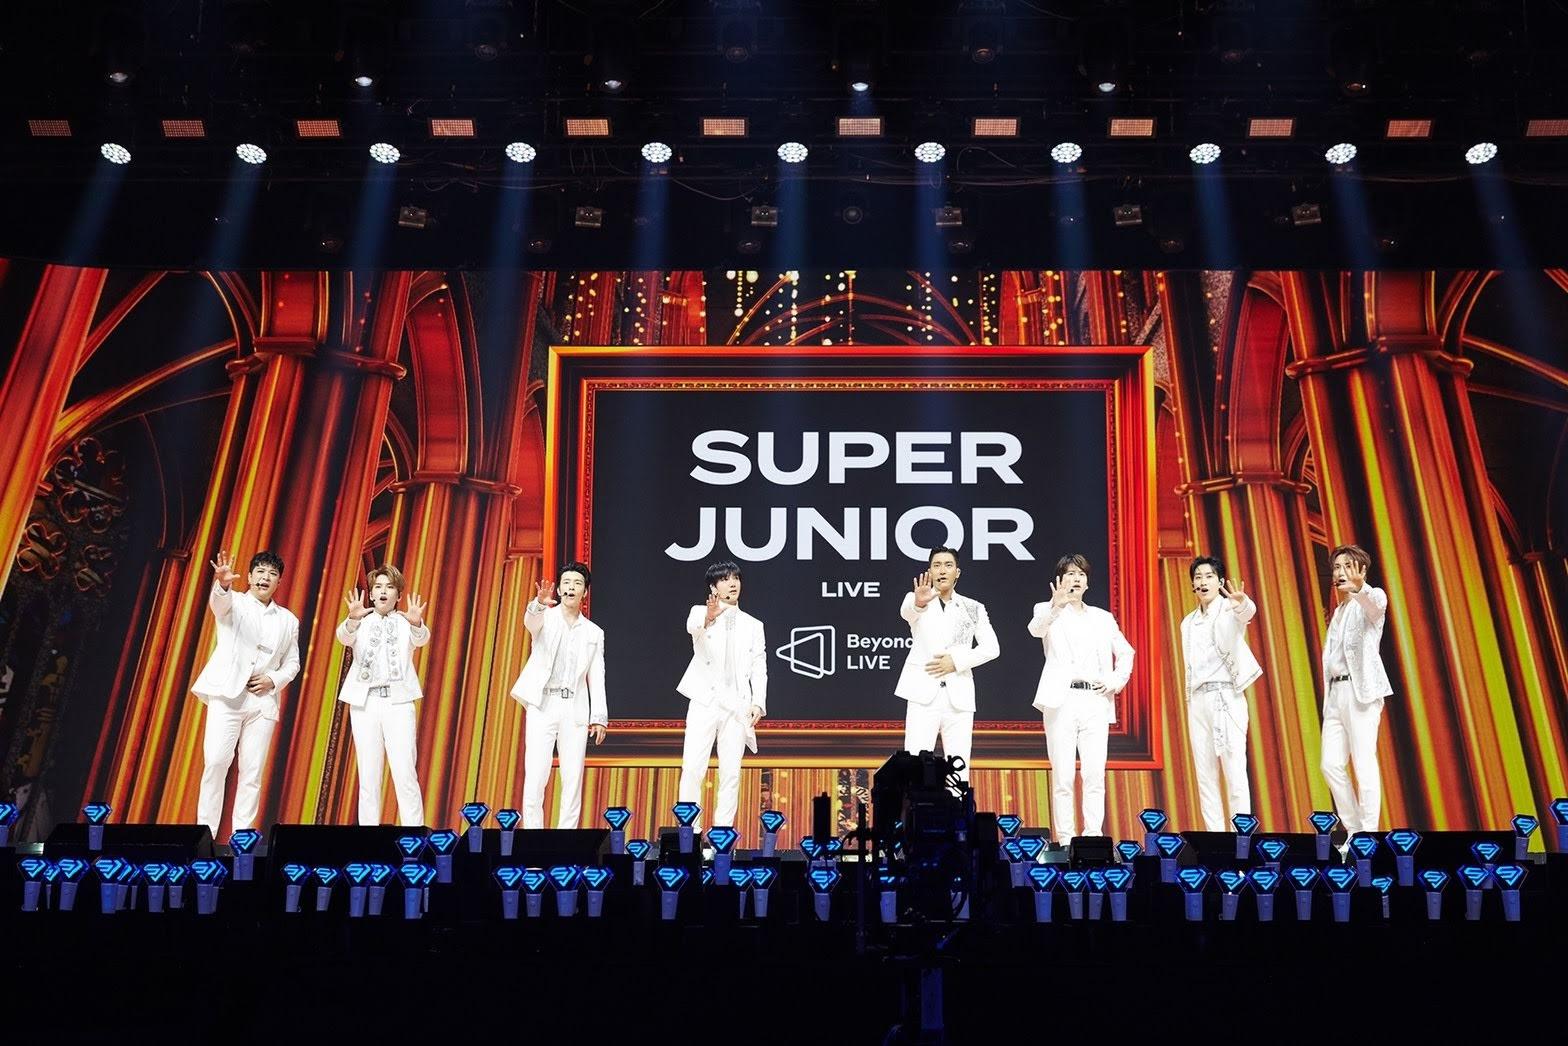 SUPER JUNIOR 線上直播演唱會「Beyond the SUPER SHOW」  帶來多首經典熱門歌曲!